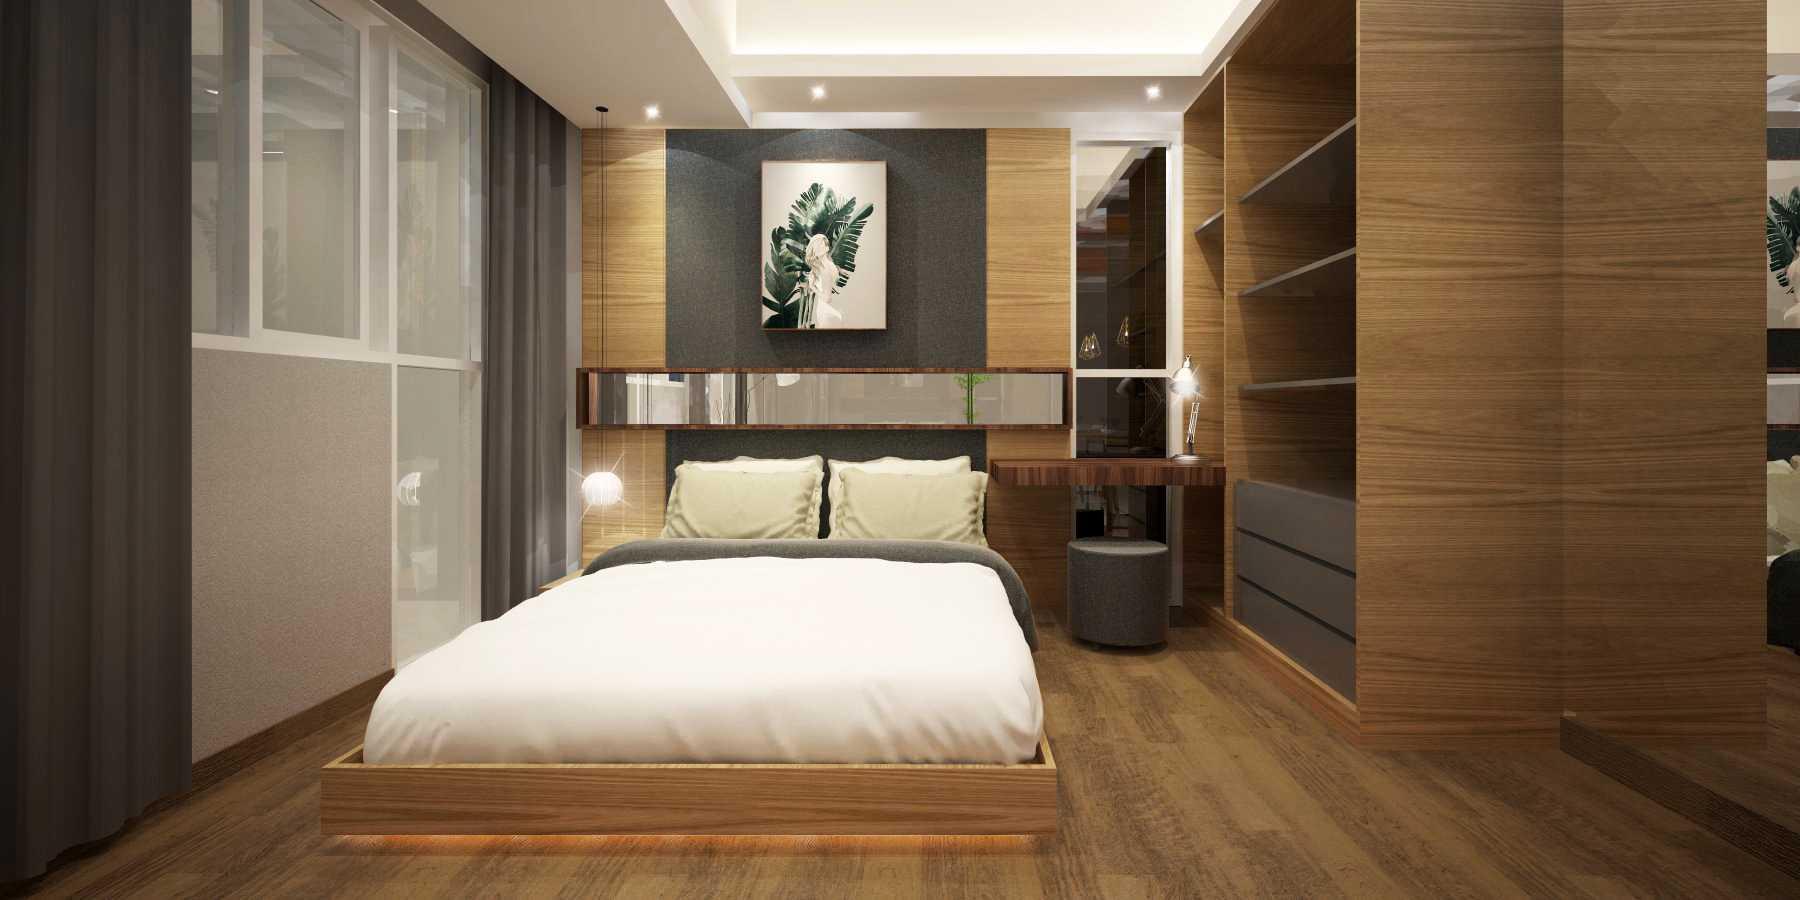 Mahastudio & Partner Show Unit Verdura Apartment Sentul, Babakan Madang, Bogor, West Java, Indonesia Sentul, Babakan Madang, Bogor, West Java, Indonesia Bedroom-3 Kontemporer  32504